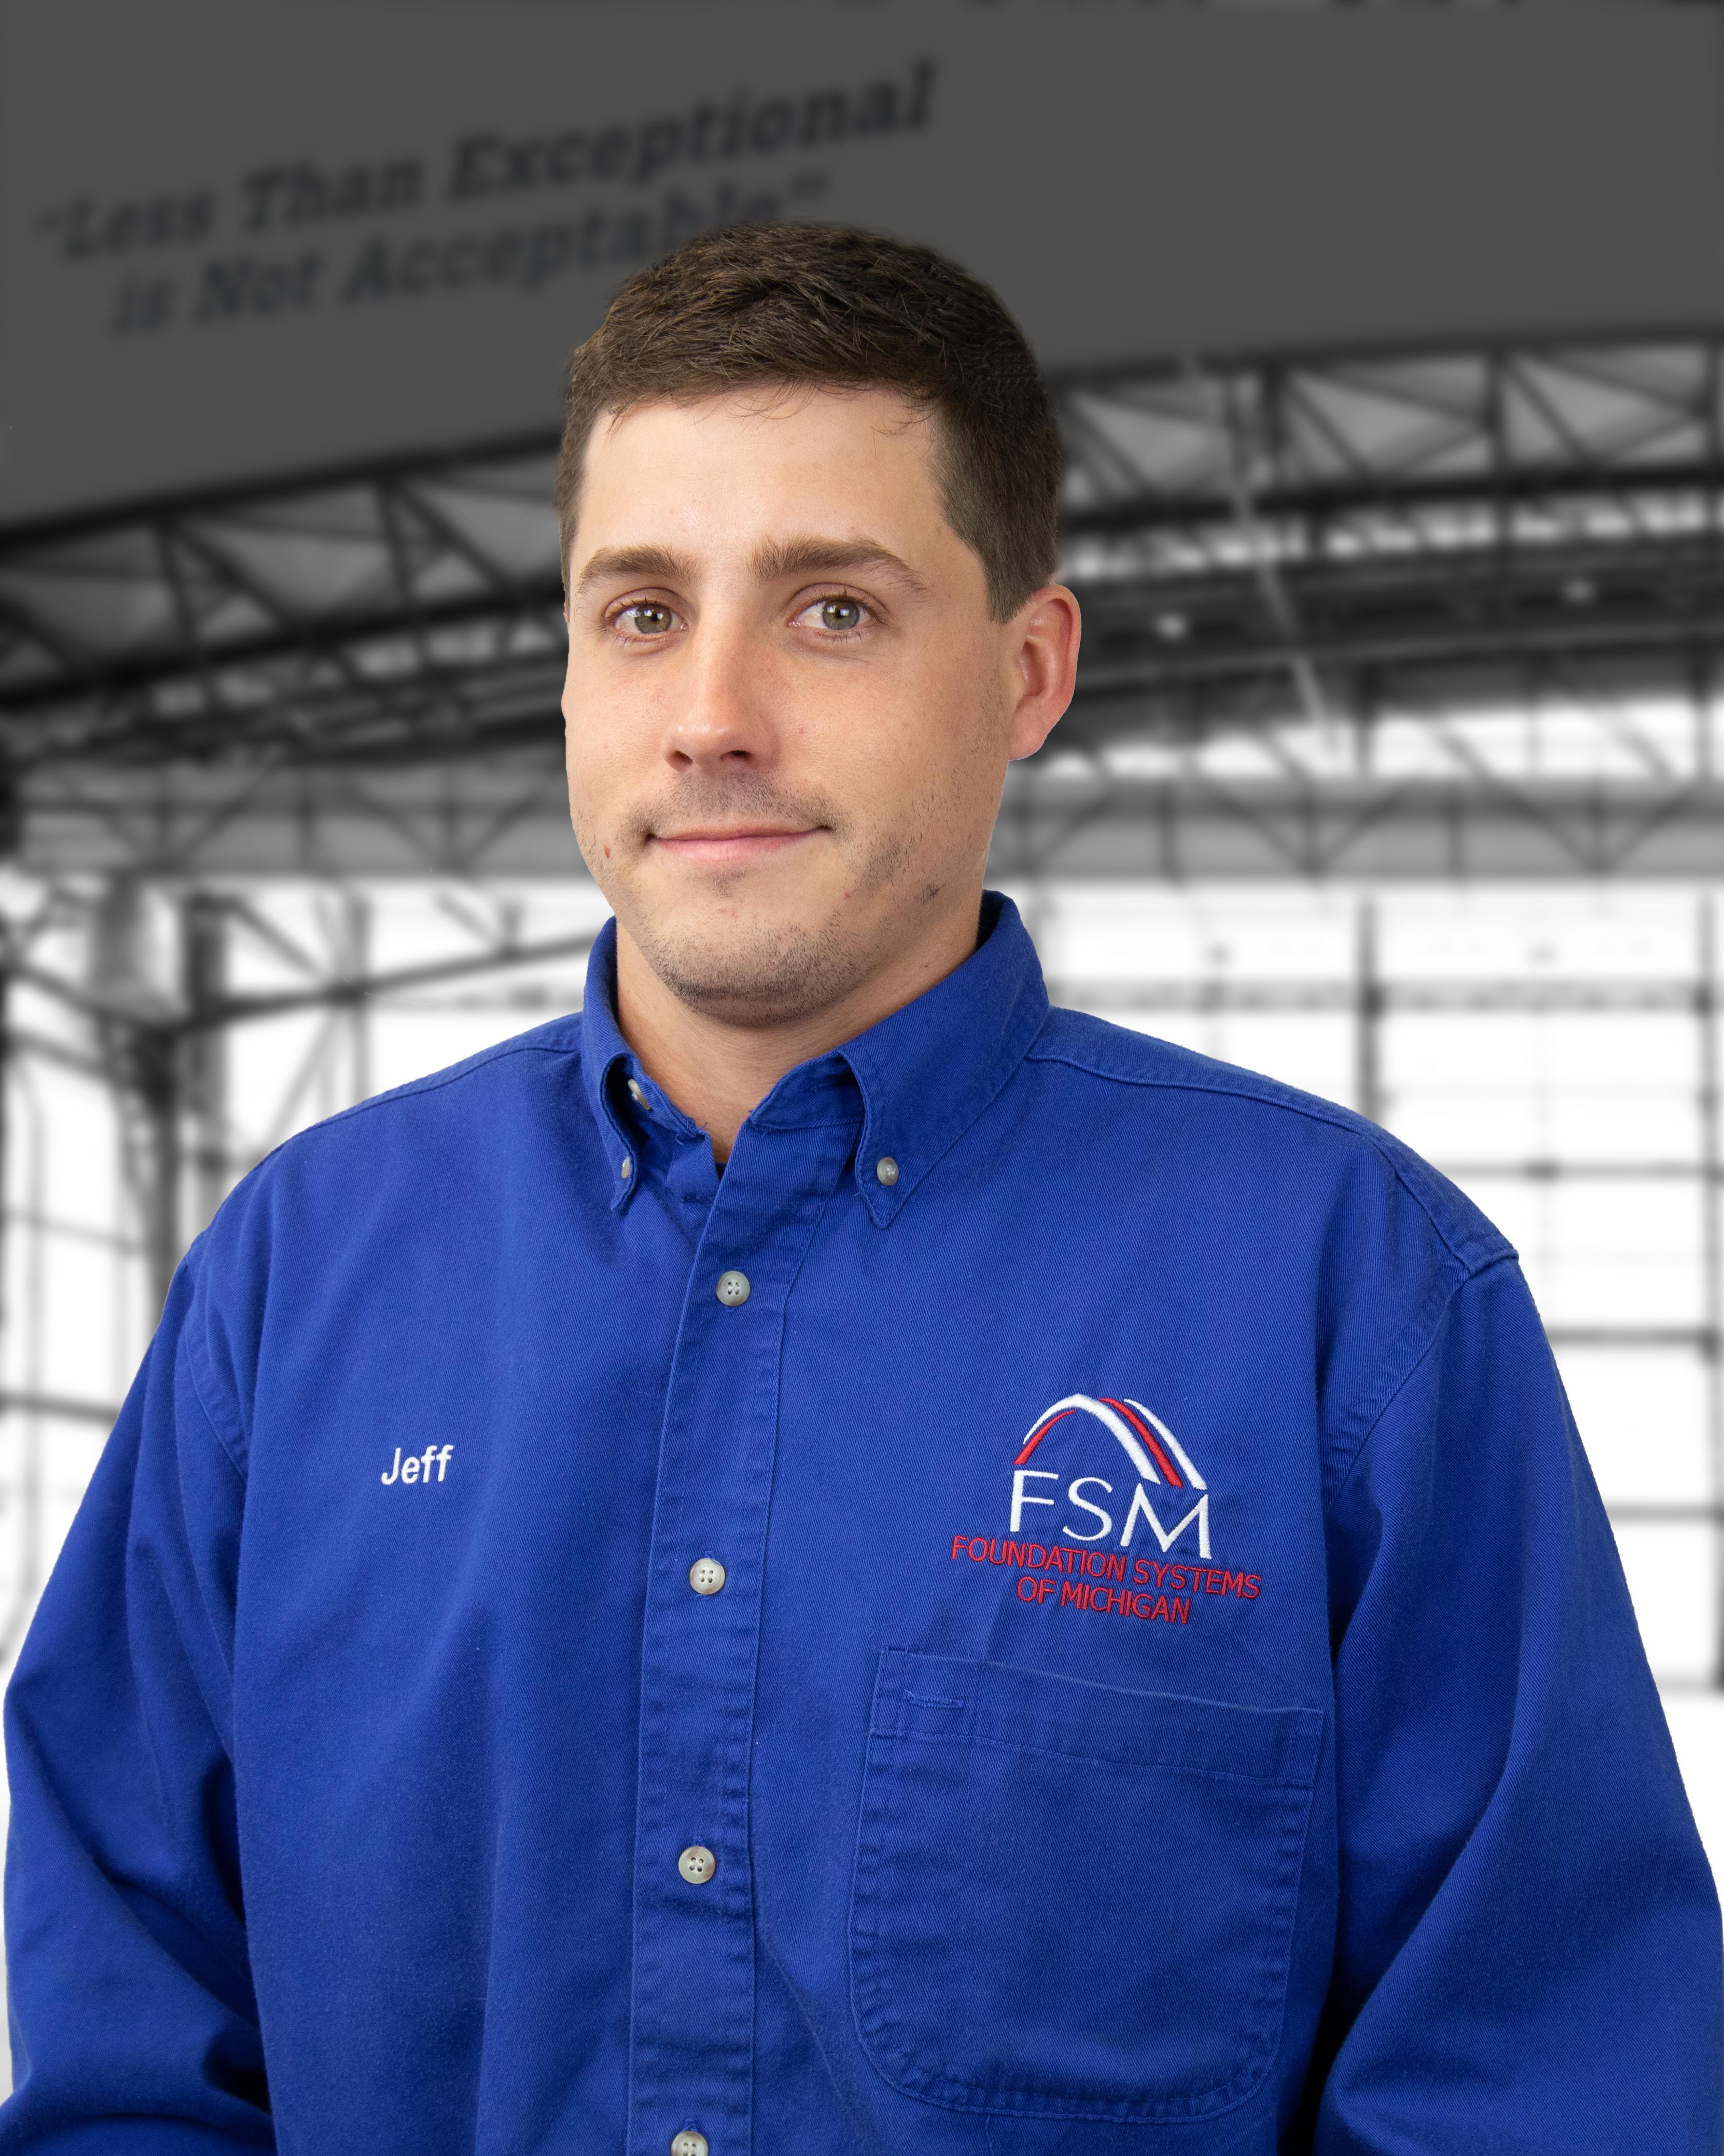 FSM Jeff Alderton Quality Supervisor